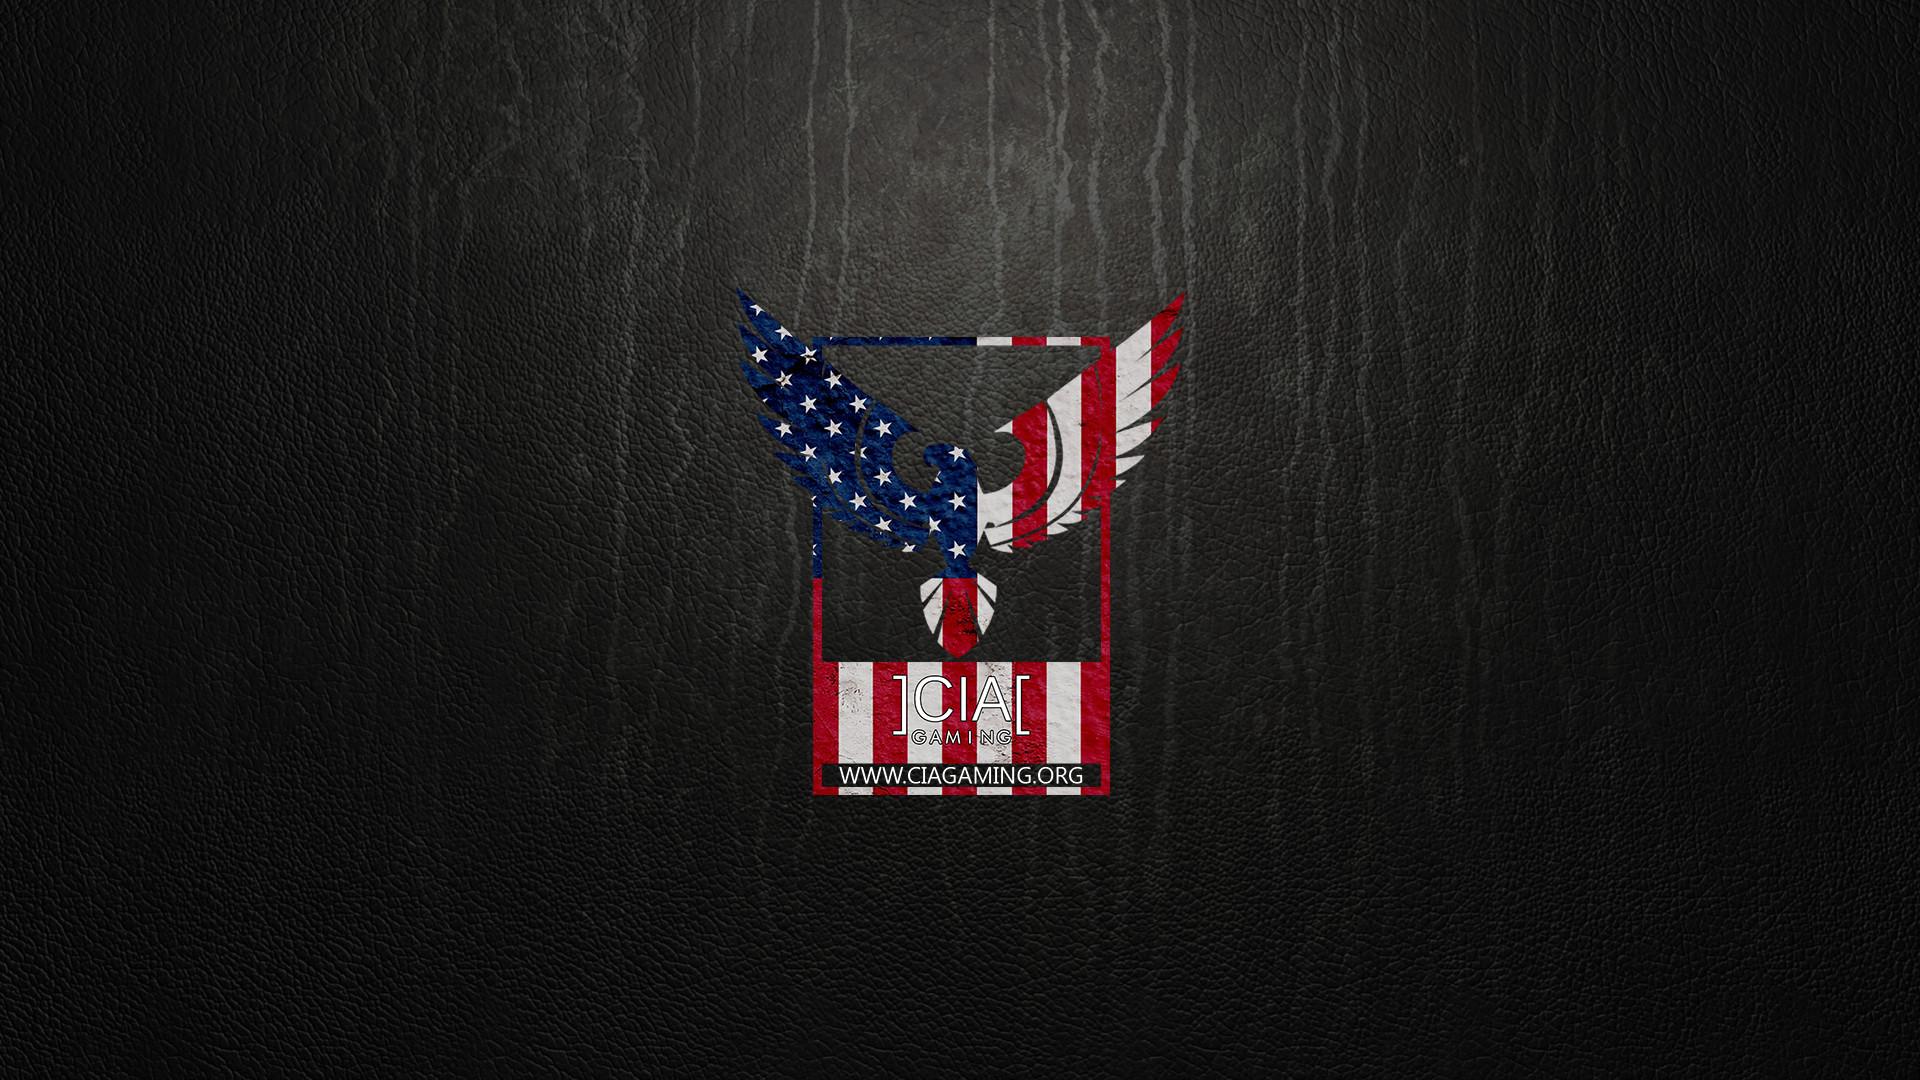 ]CIA[ US Logo